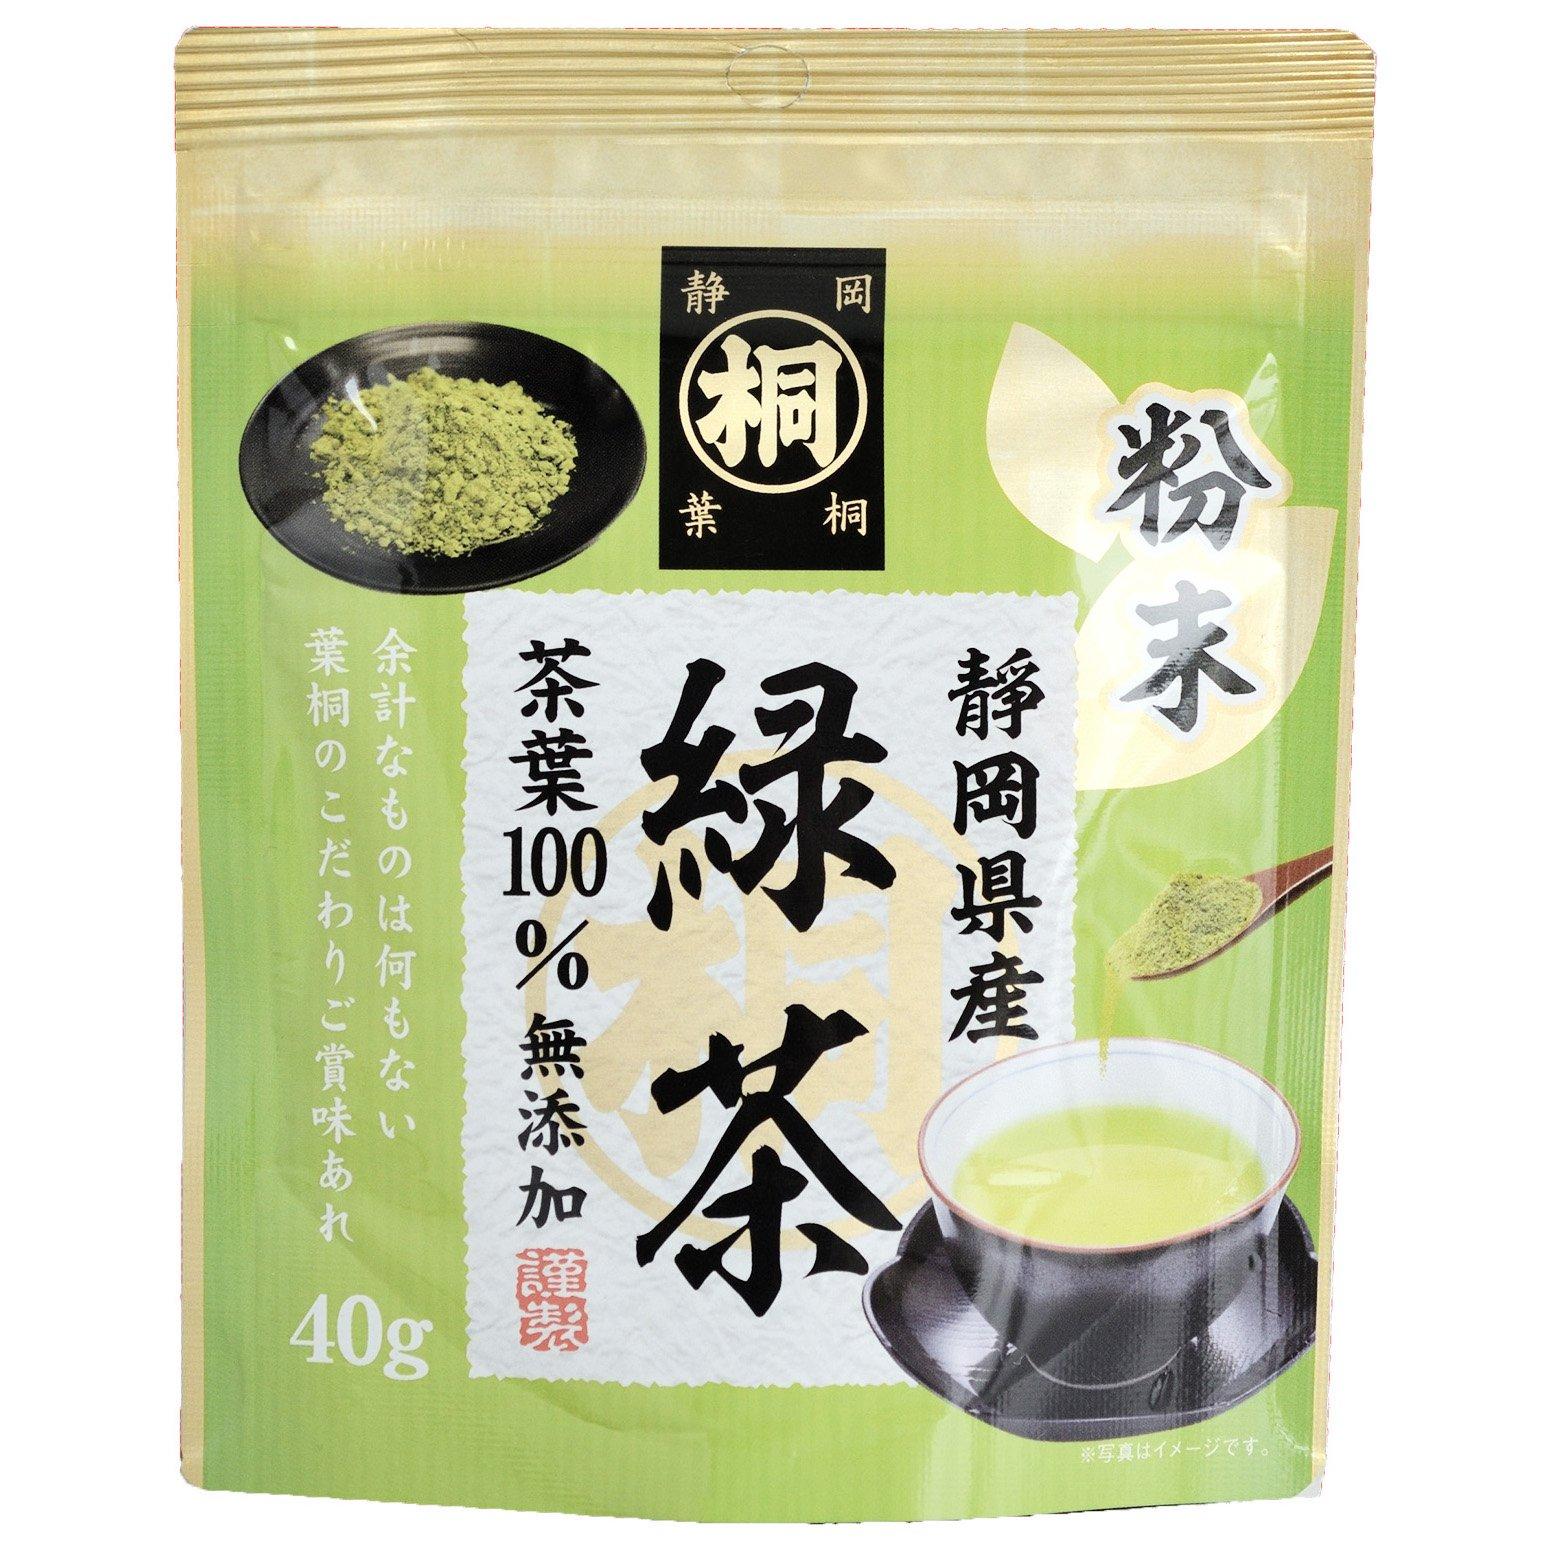 静岡産マル桐粉末緑茶